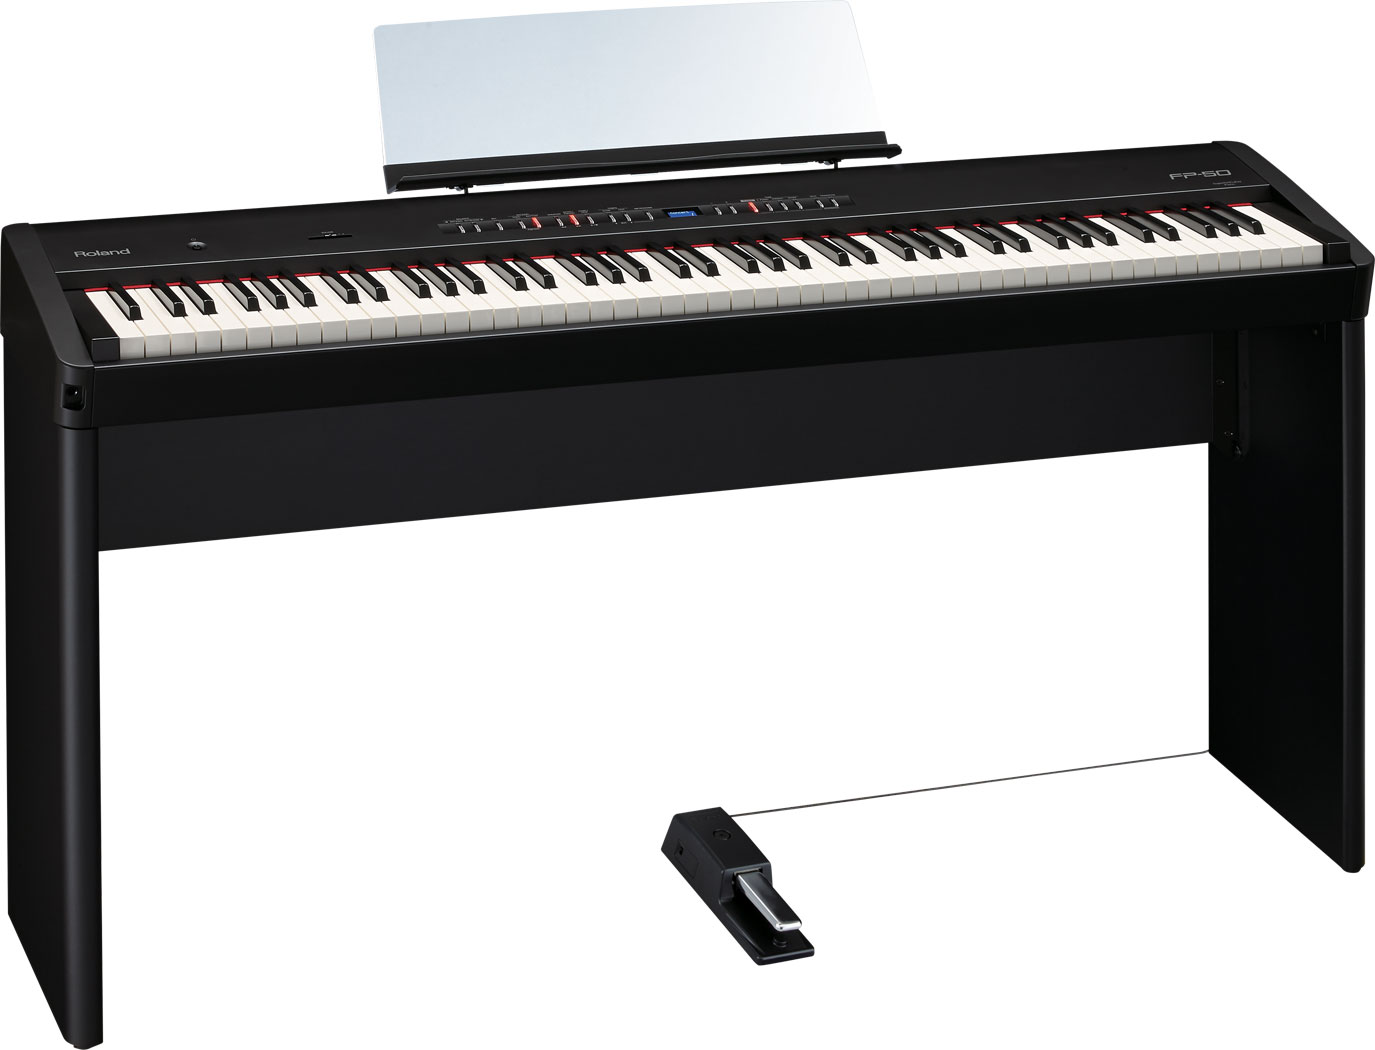 roland fp50 digital piano. Black Bedroom Furniture Sets. Home Design Ideas